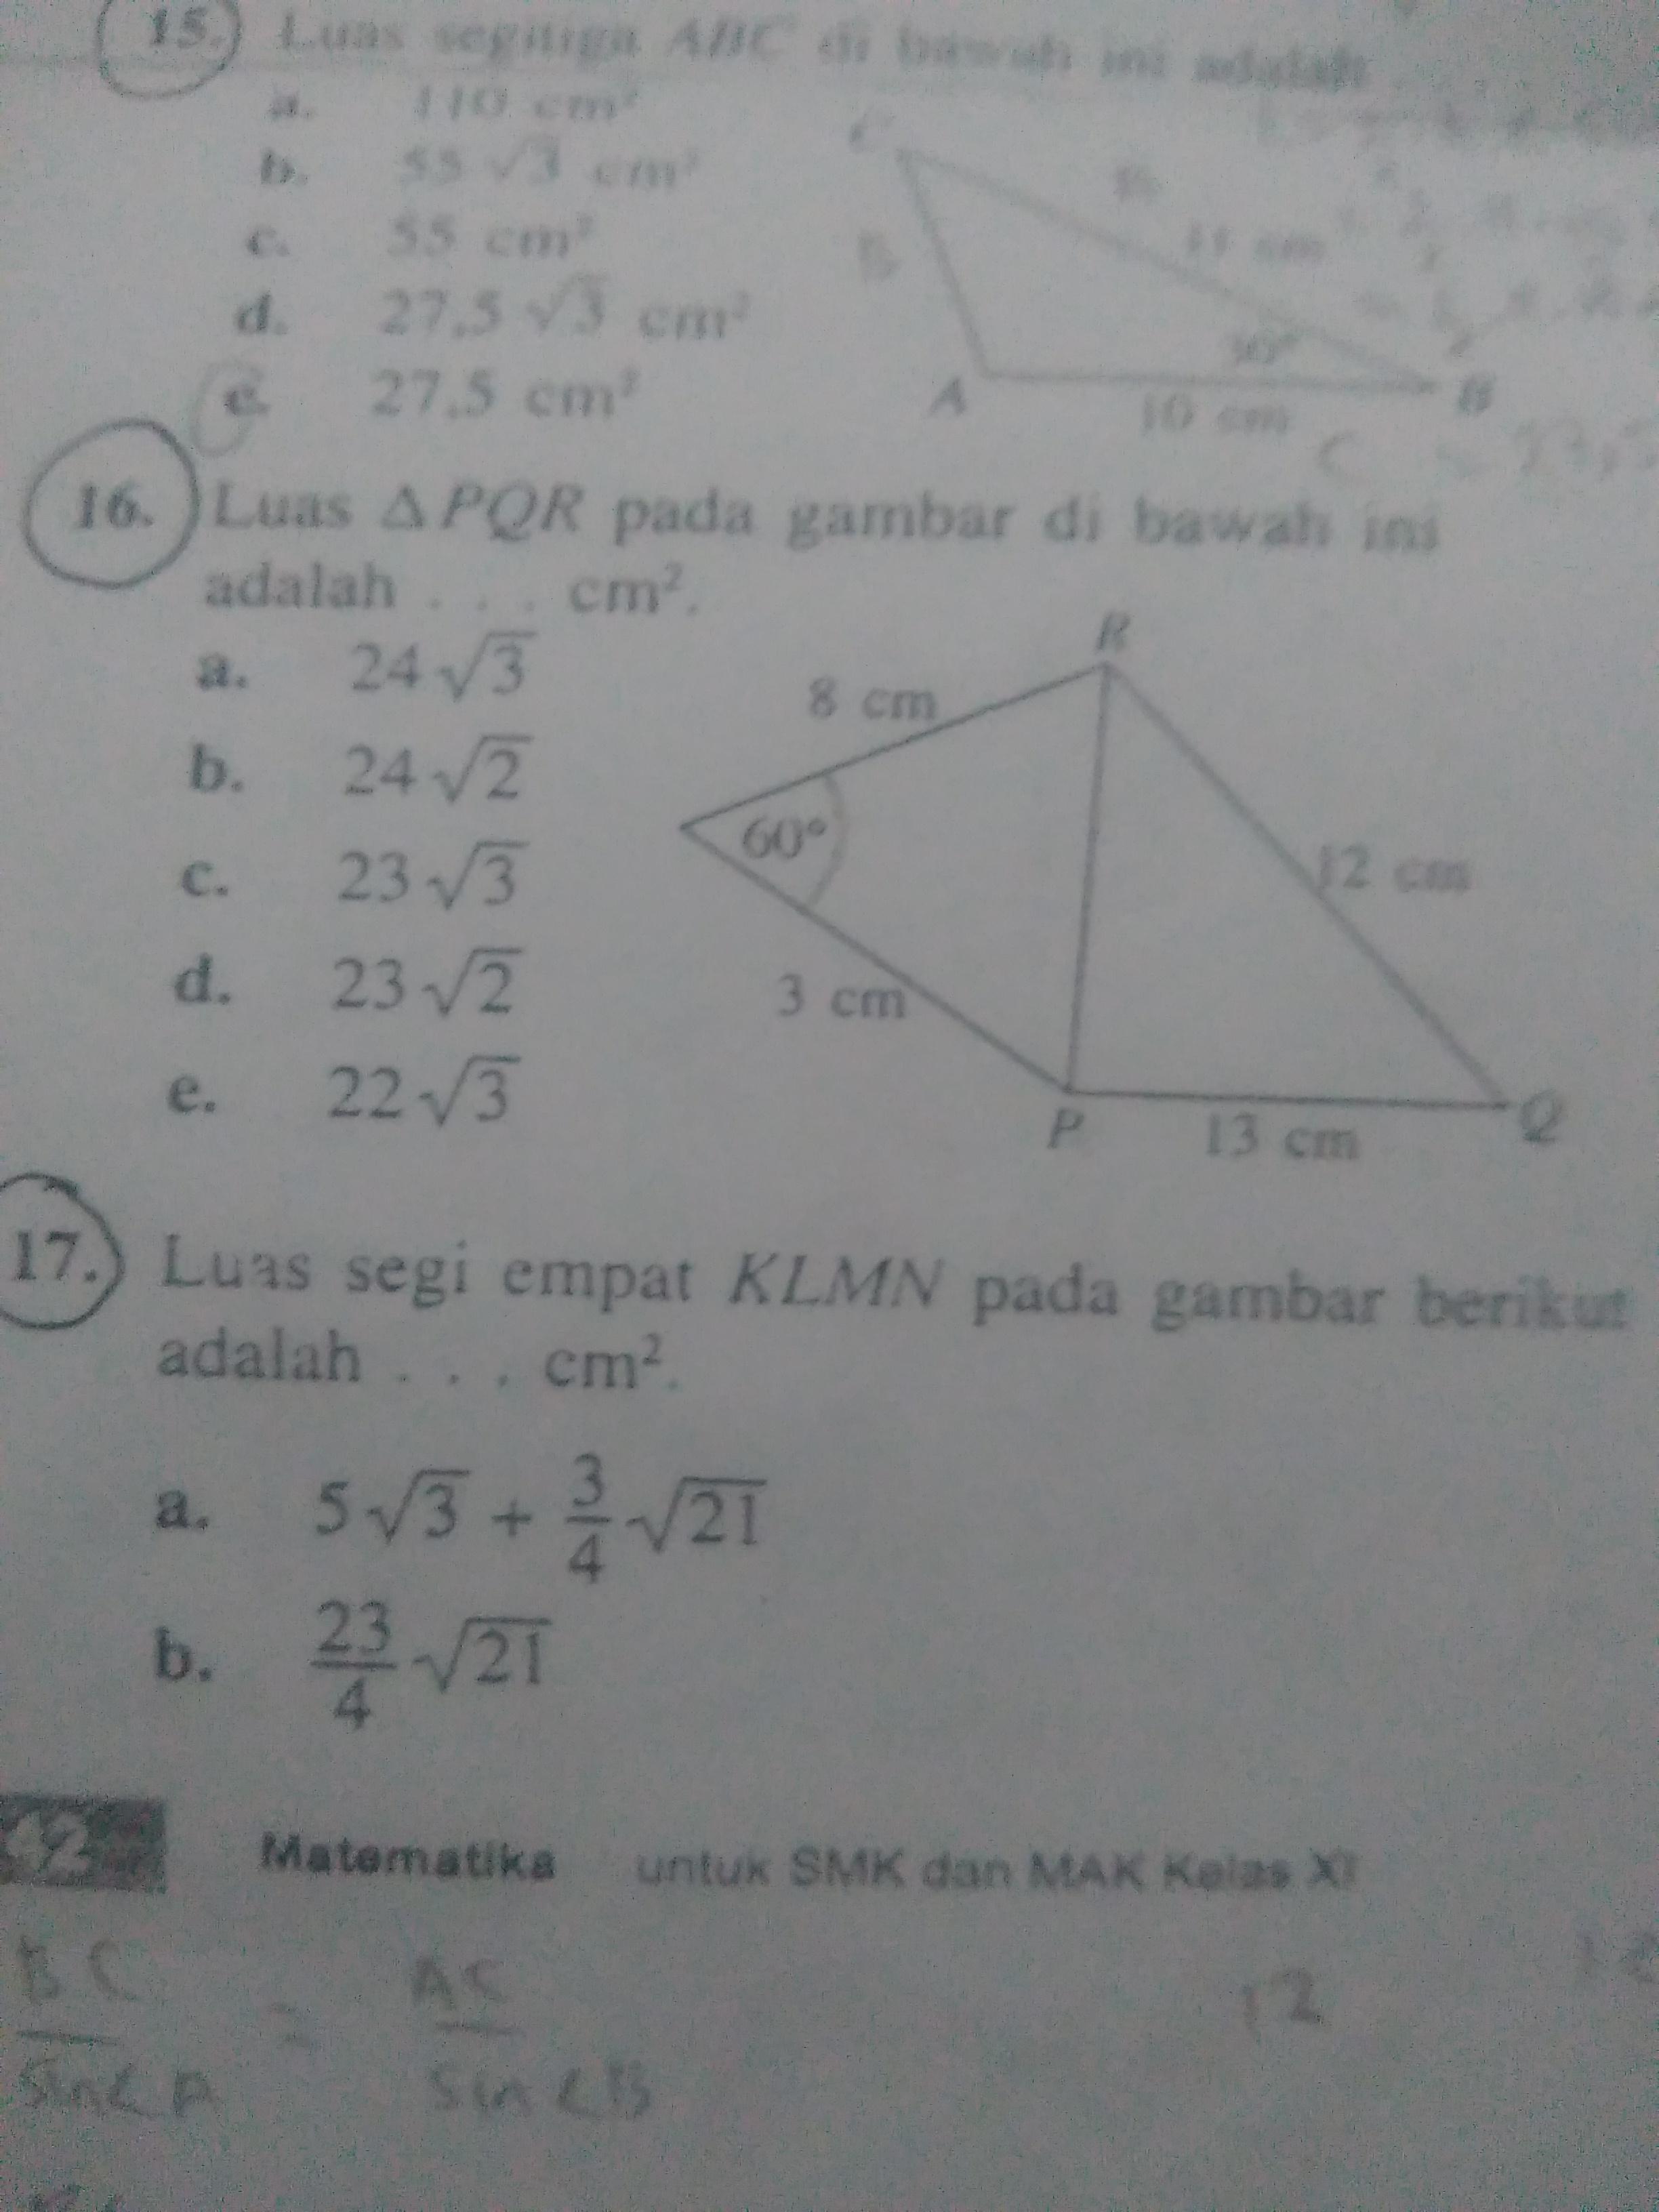 Luas segitiga PQR pada gambar di bawah ini adalah (no. 16 ...